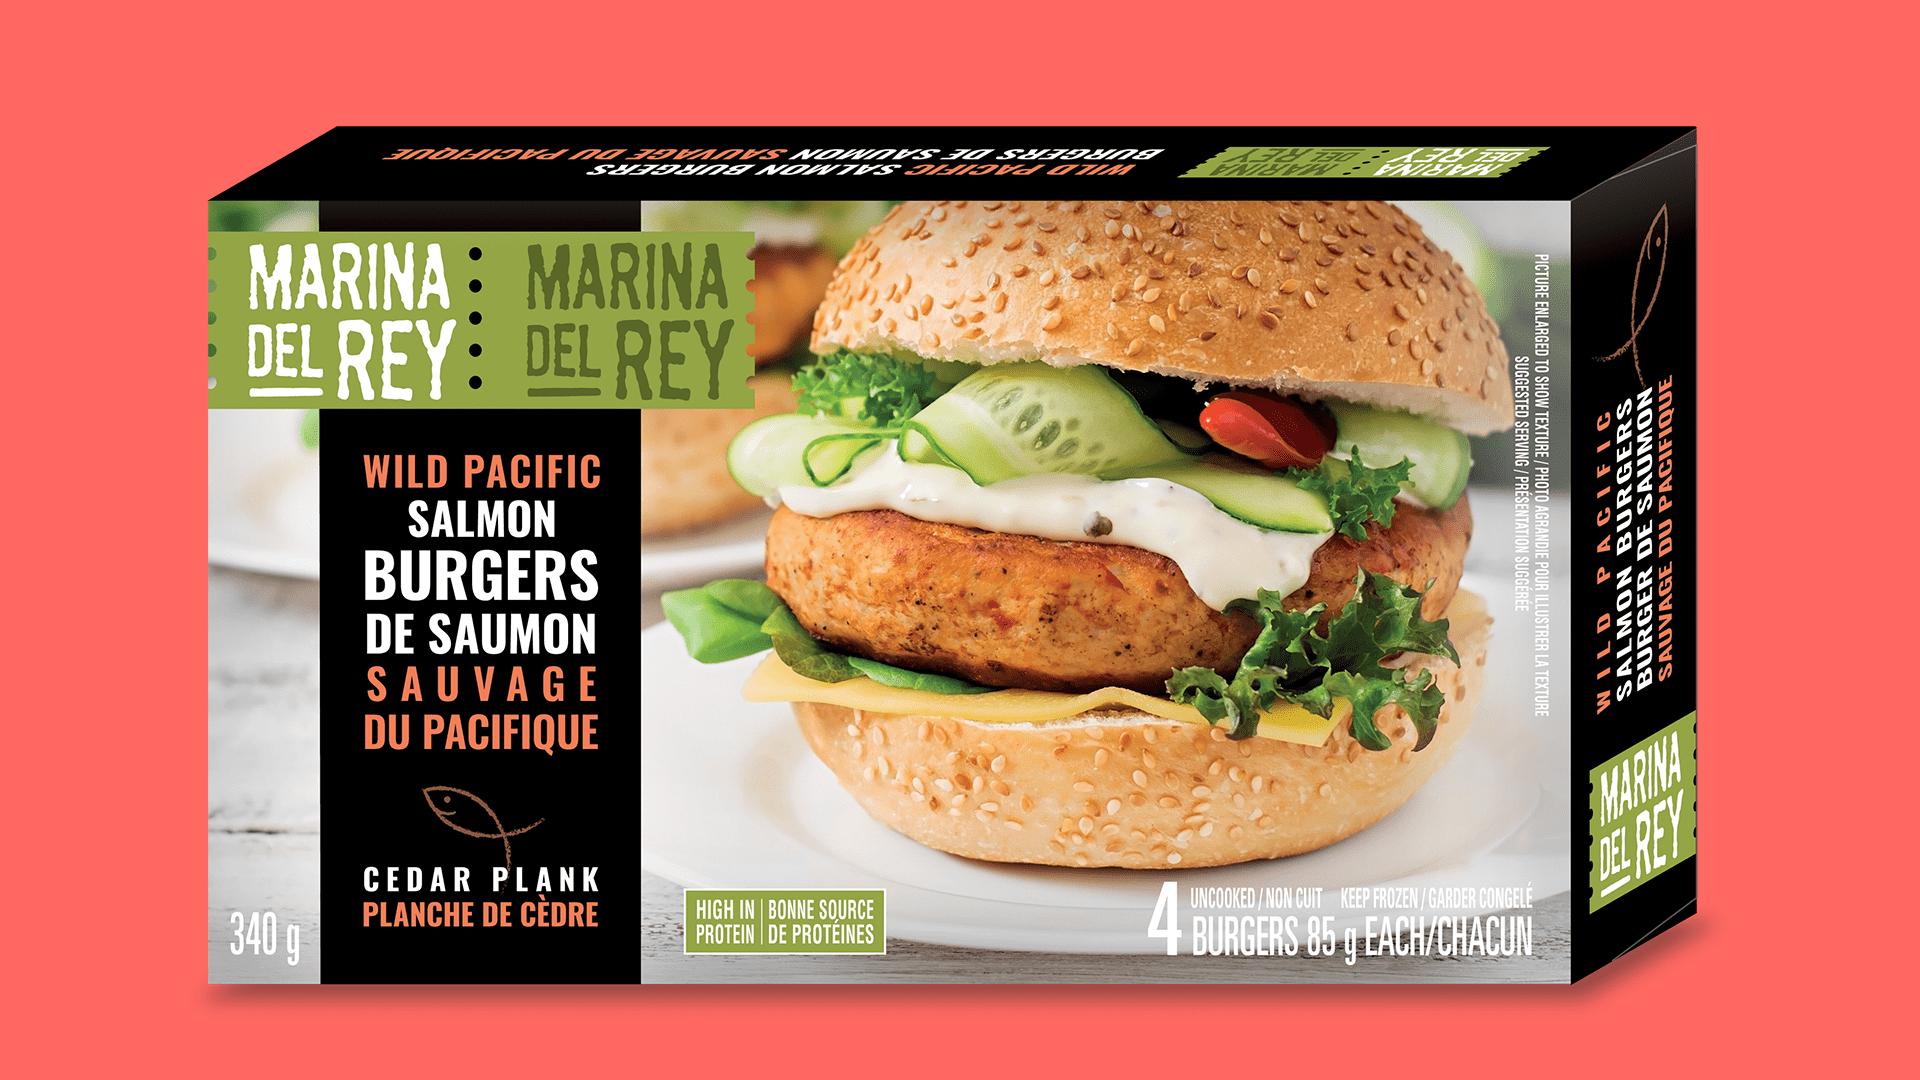 Wild Pacific Salmon Burgers